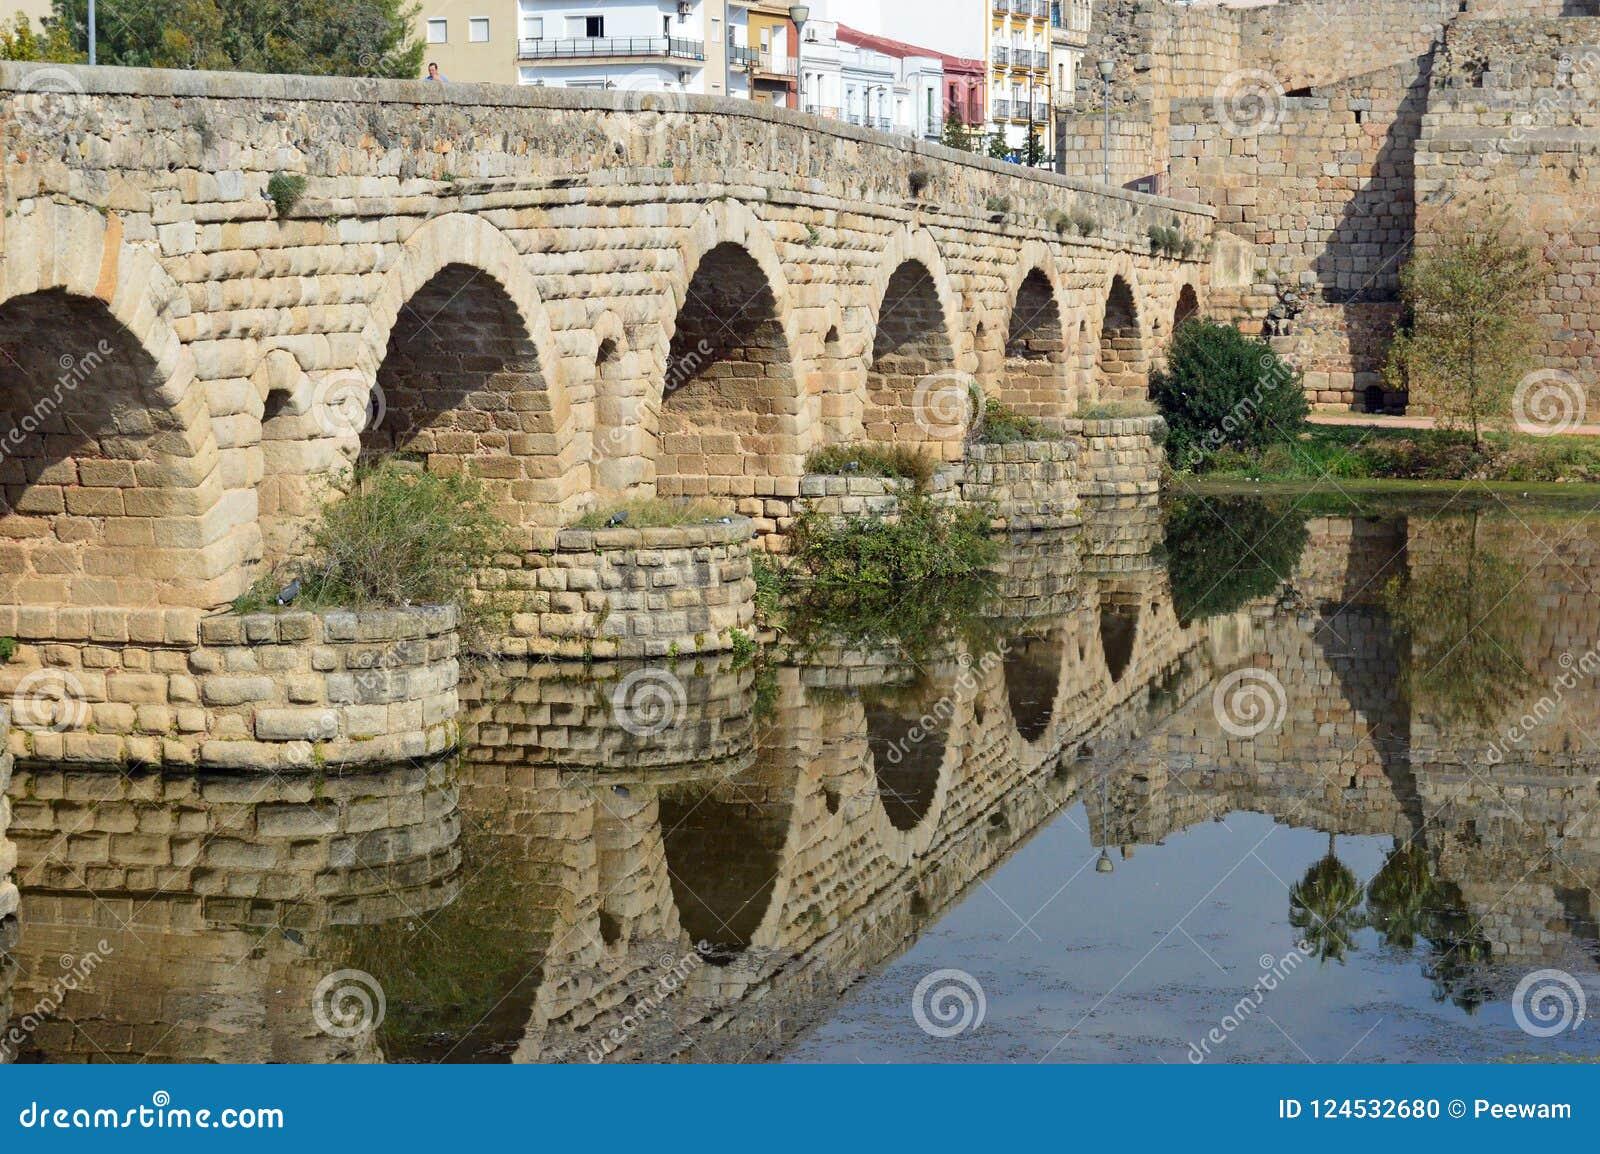 Puente Romana, Roman Bridge, Merida Spain